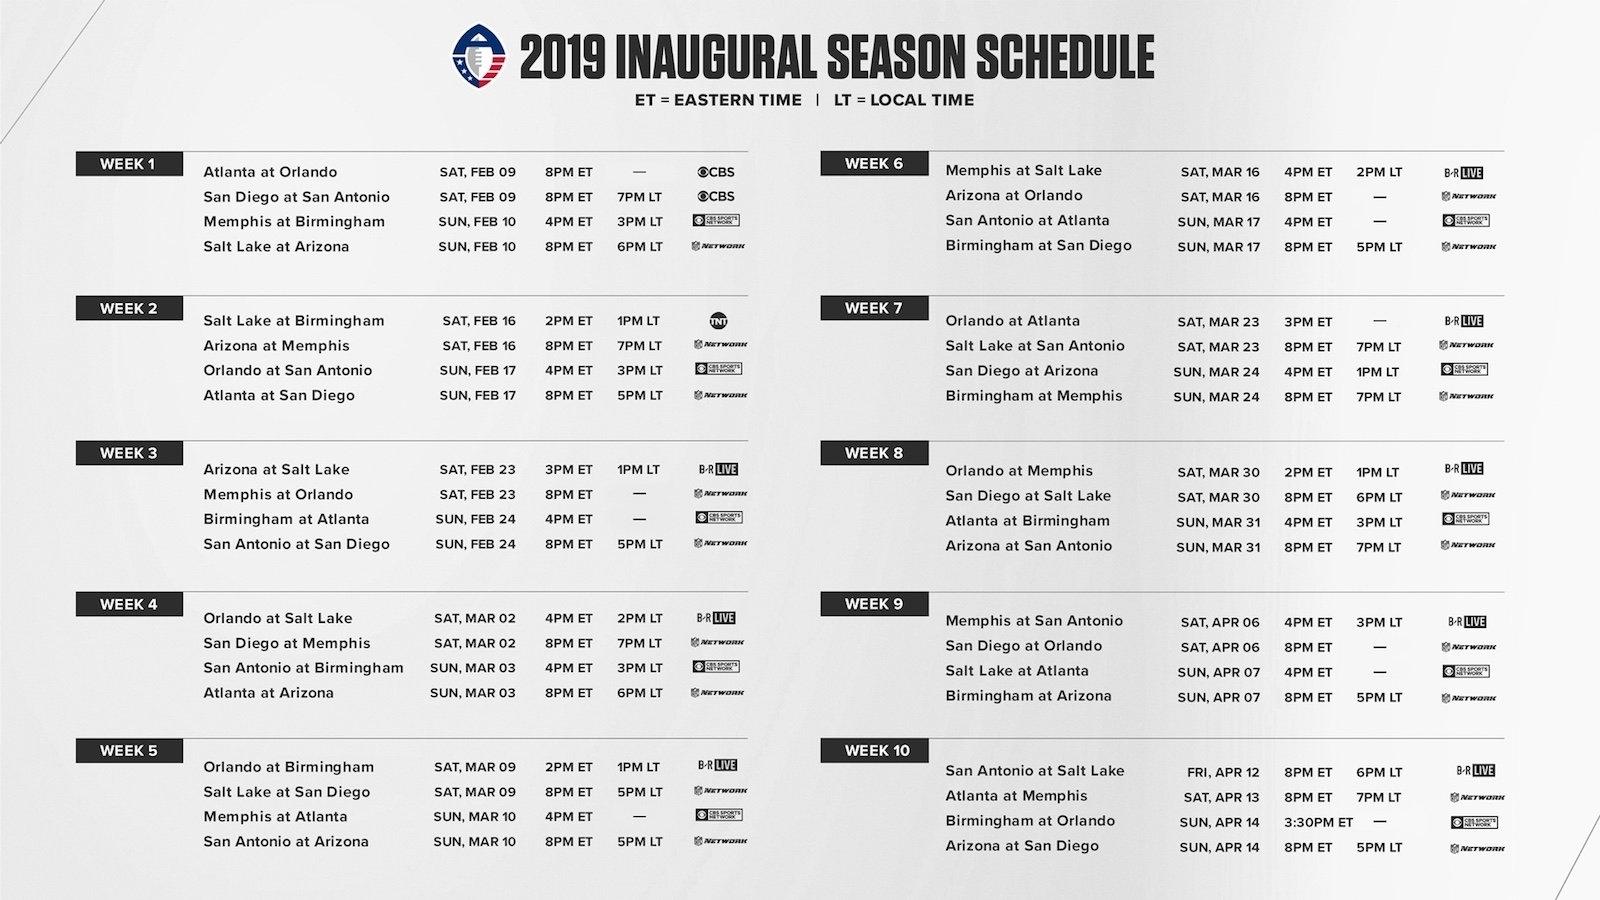 Printable Nfl Schedule 2019 2020 Season - Calendar